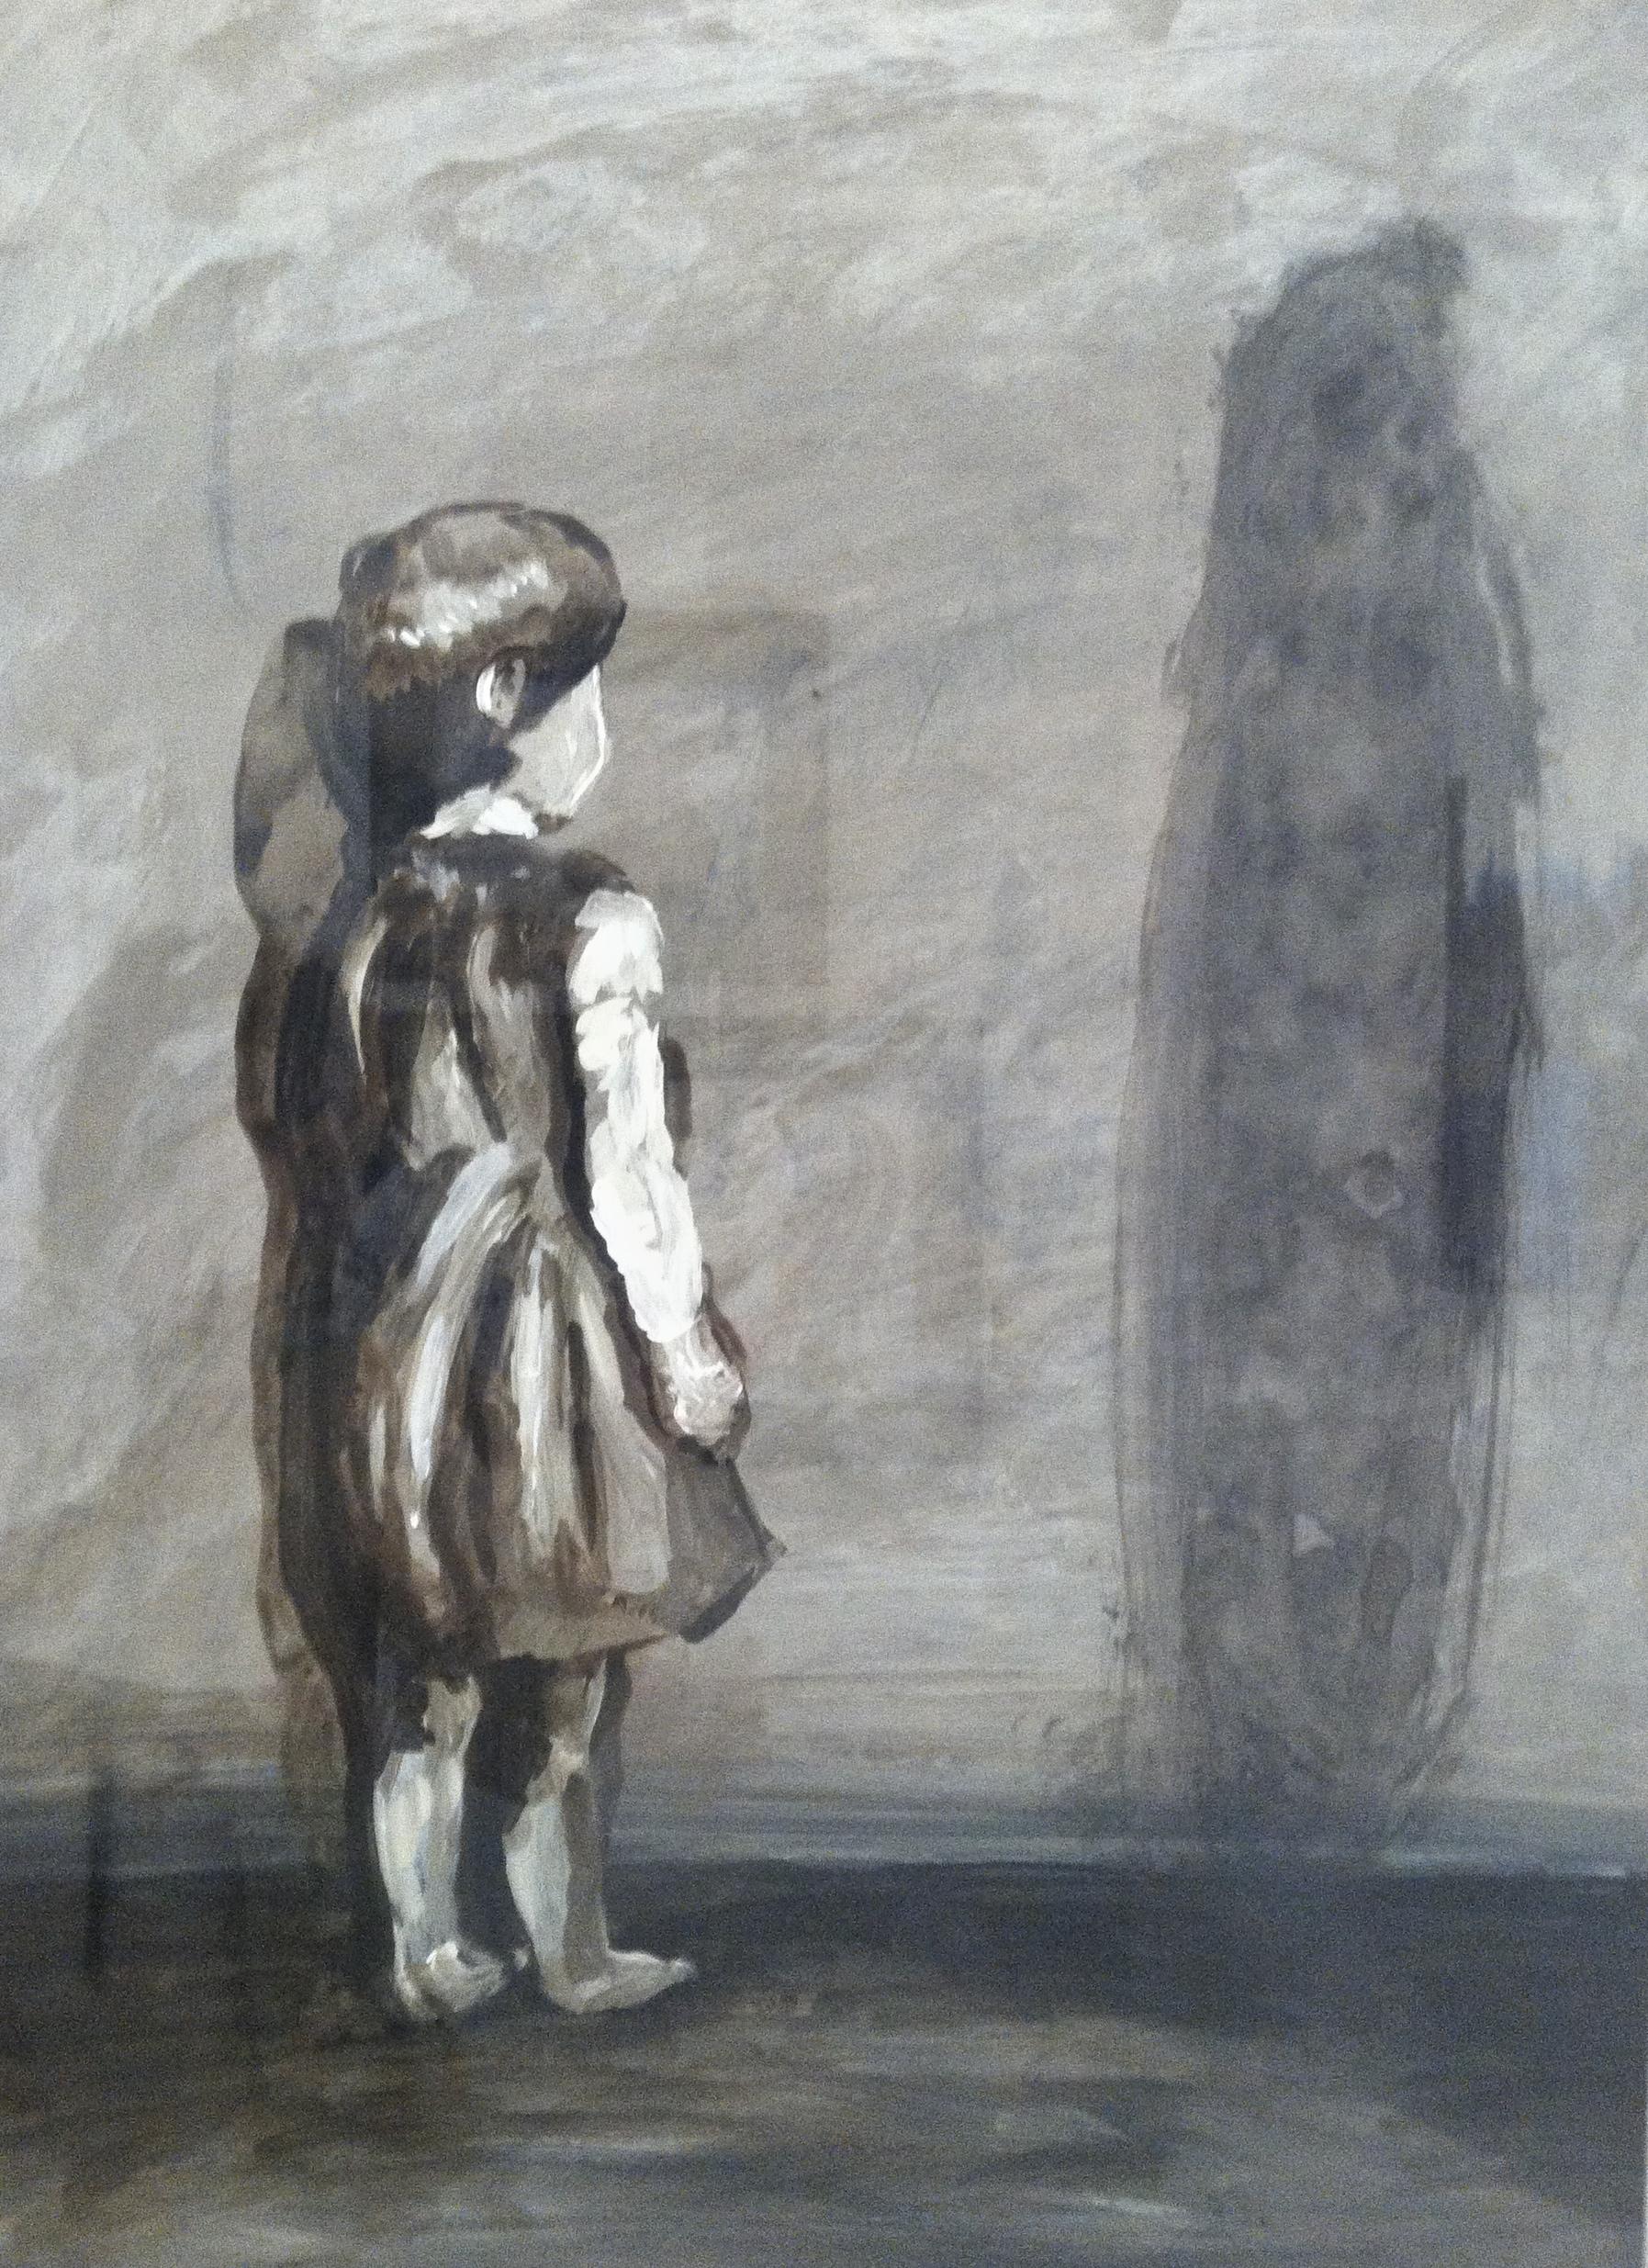 Girl Alone Cathy Glass Summ